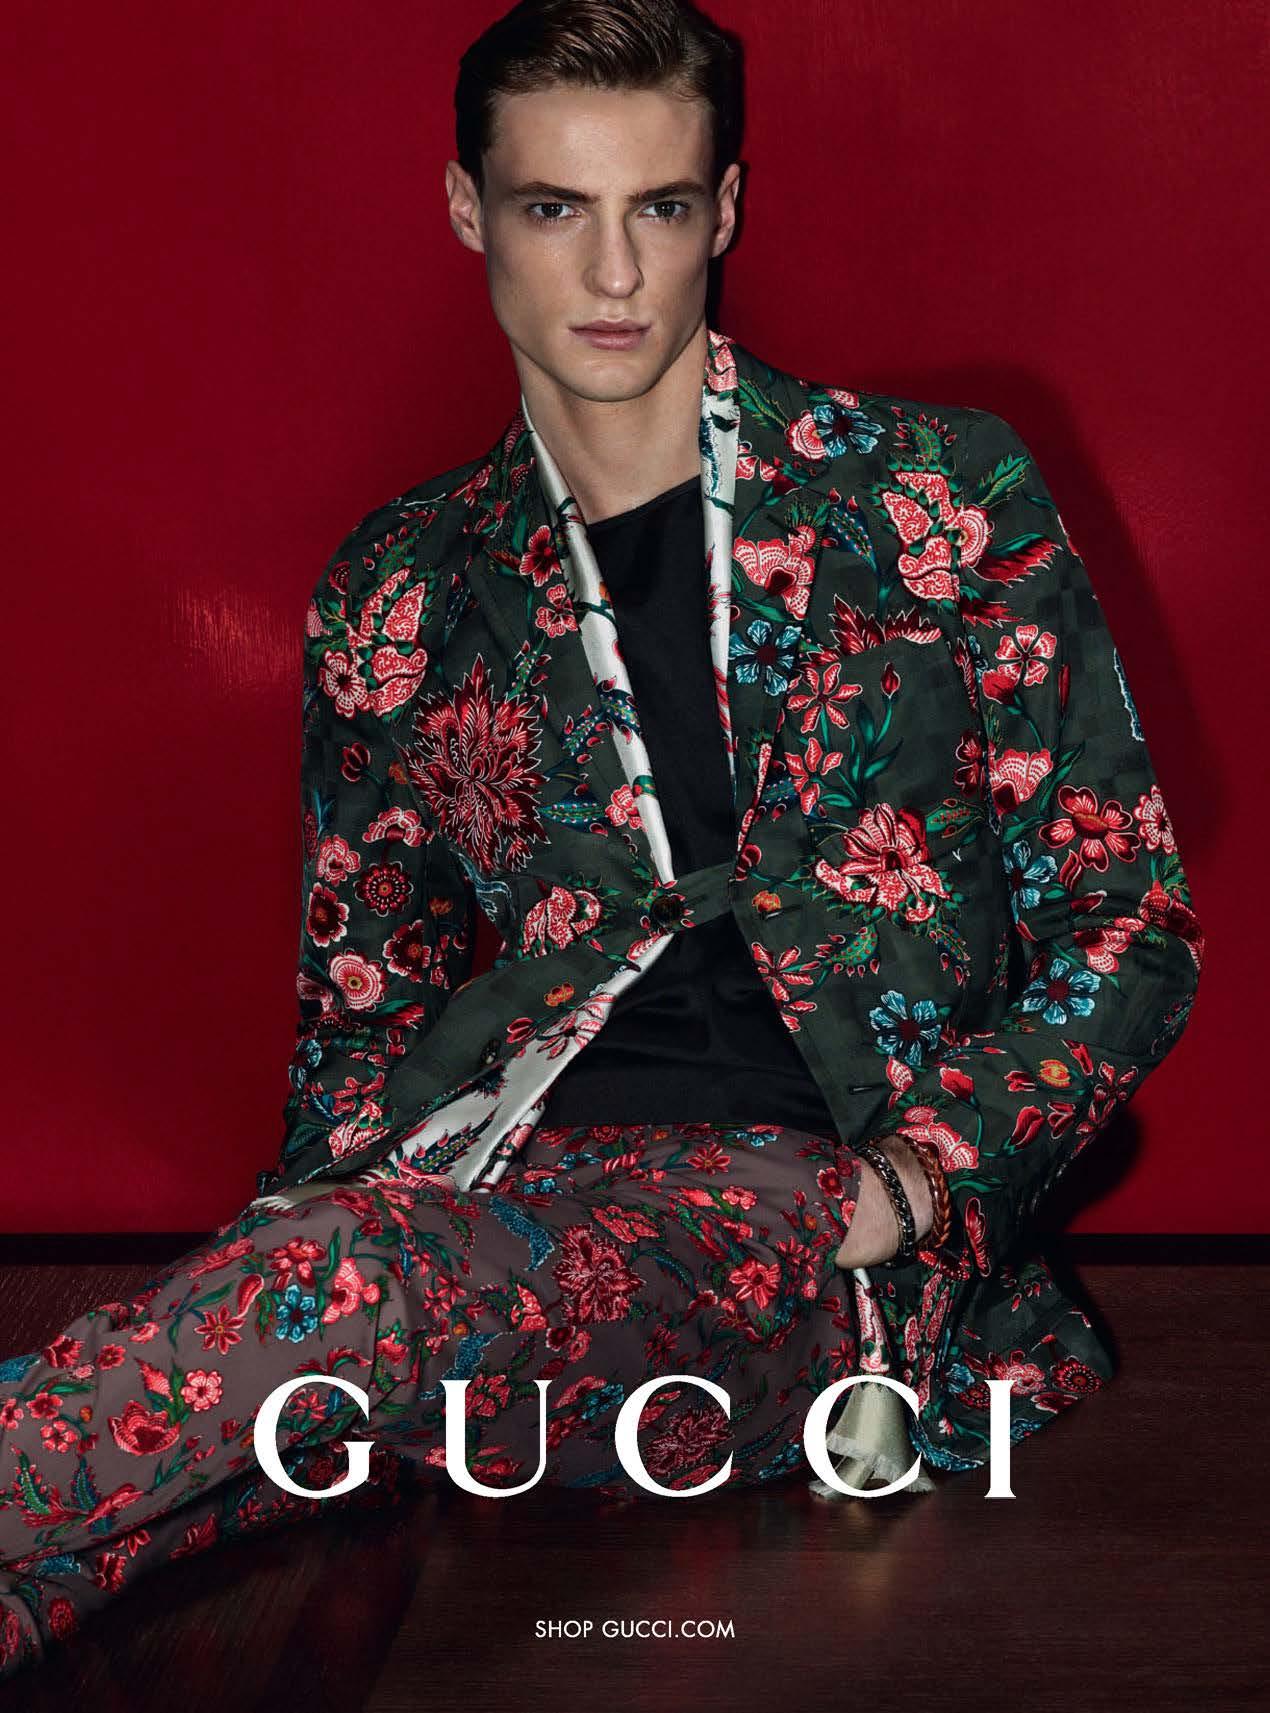 Gucci Spring Summer 2014 Ad Campaign